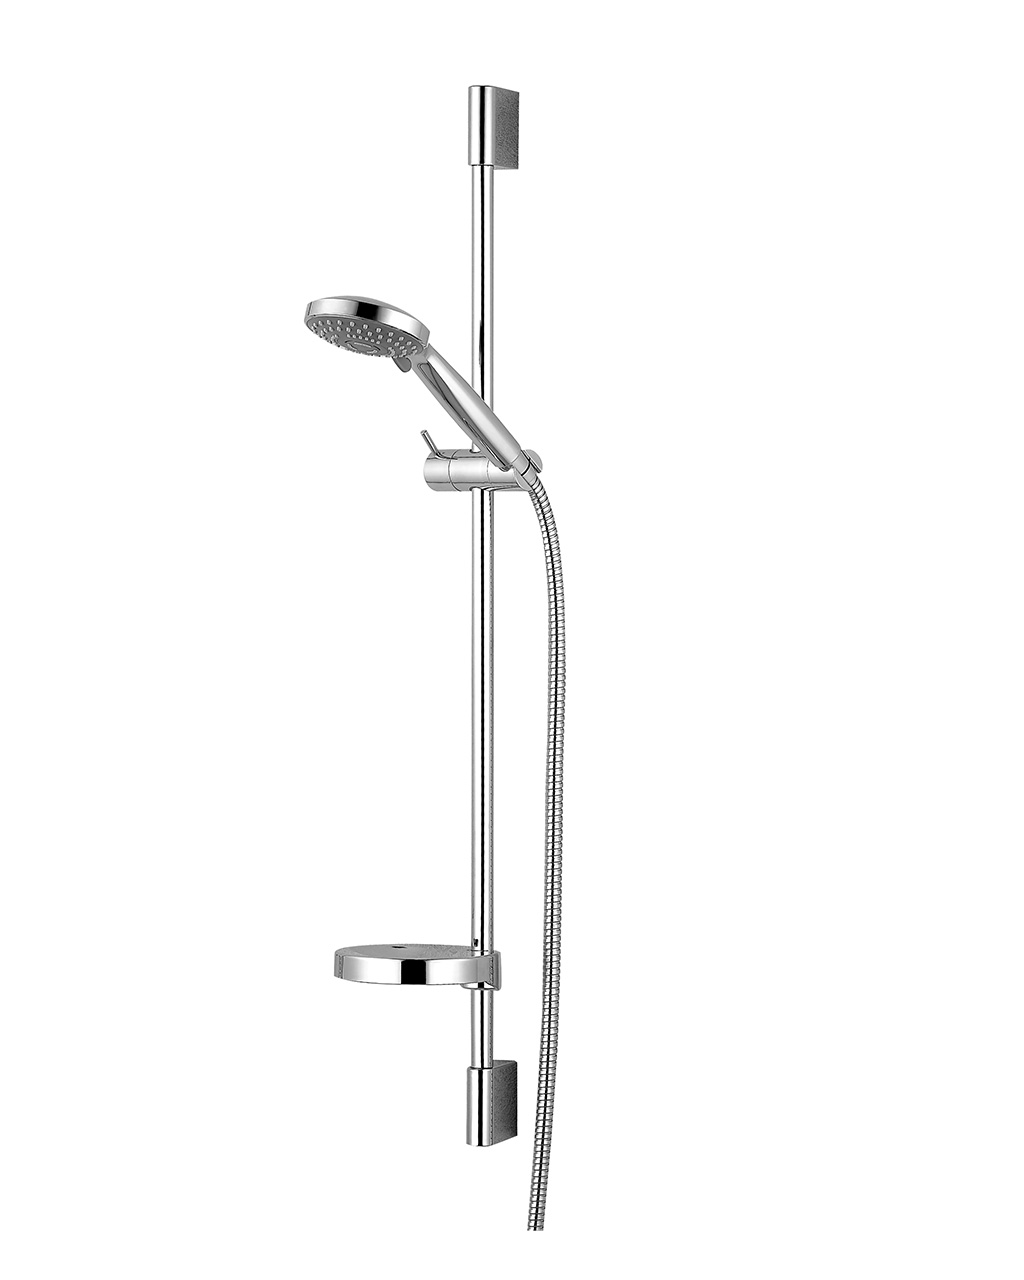 Душевая штанга IMPRESE DOBRANY L-82см,мыльница,ручной душ 3 режима,шланг 1,5м с вращающимся конусом (Anti-Twist),блистер 8210003